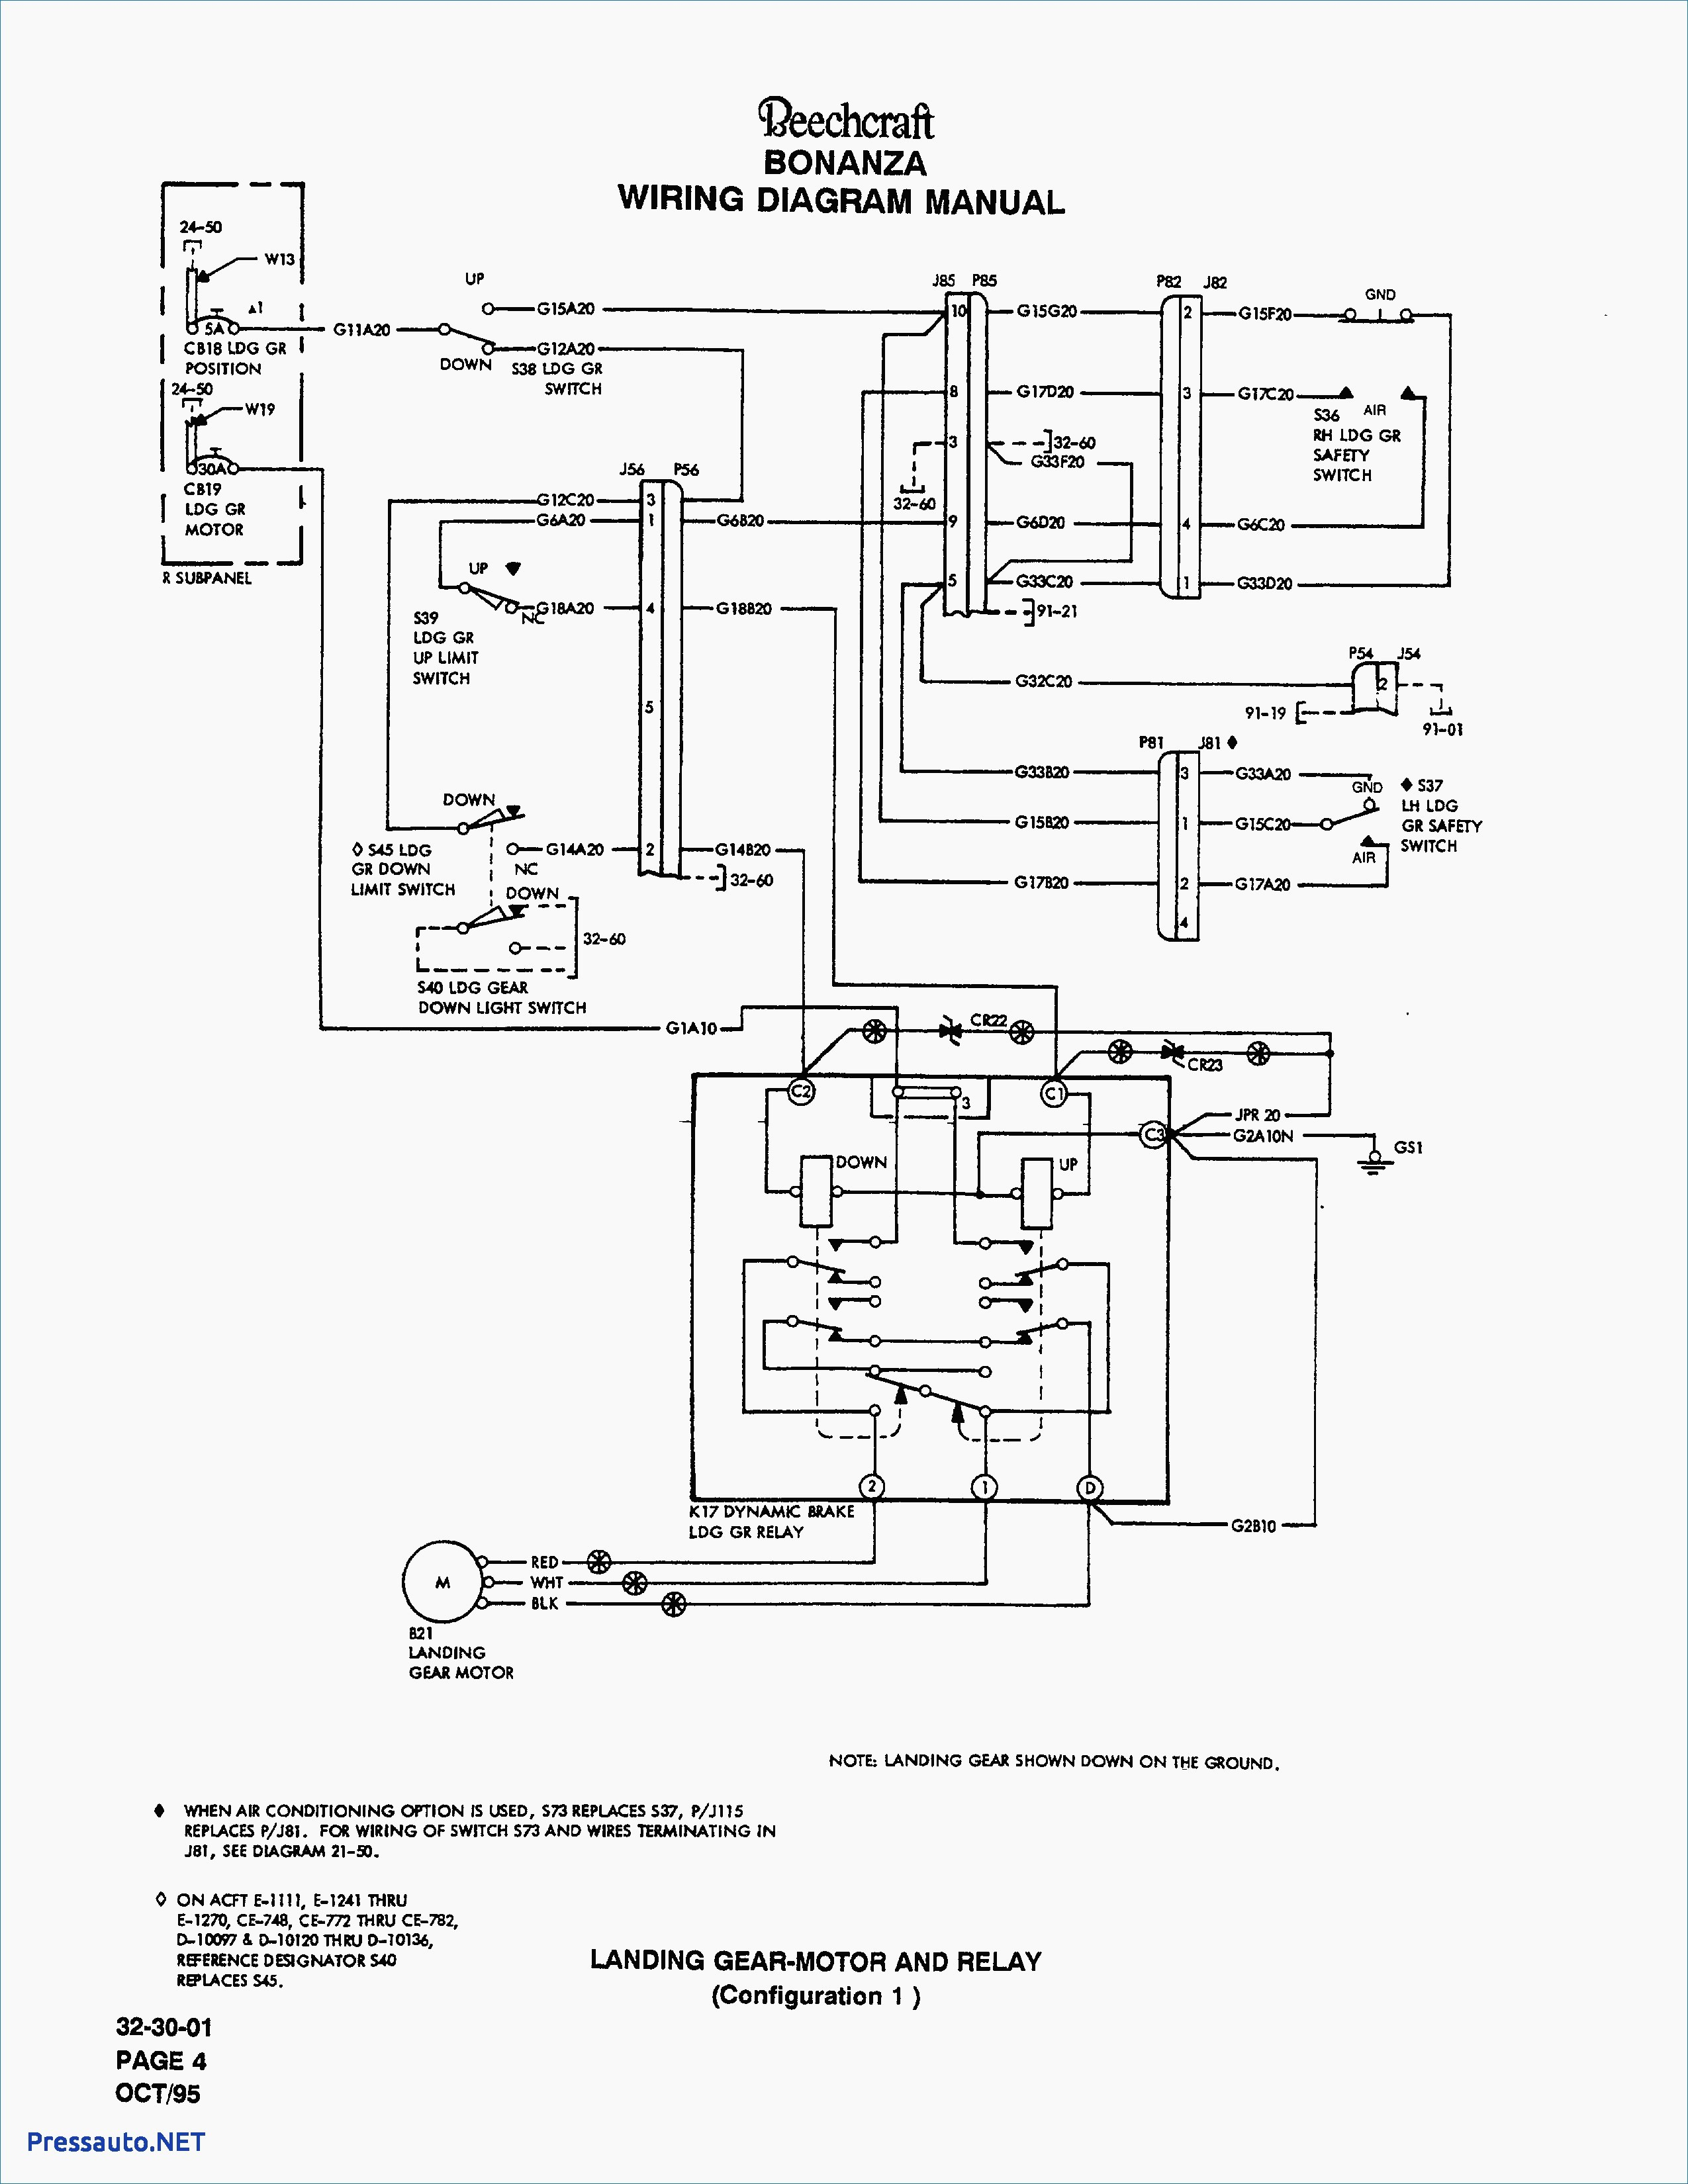 Solenoid patlite lme 02l wiring diagram circuit connection diagram on starter diagram solenoid actuator